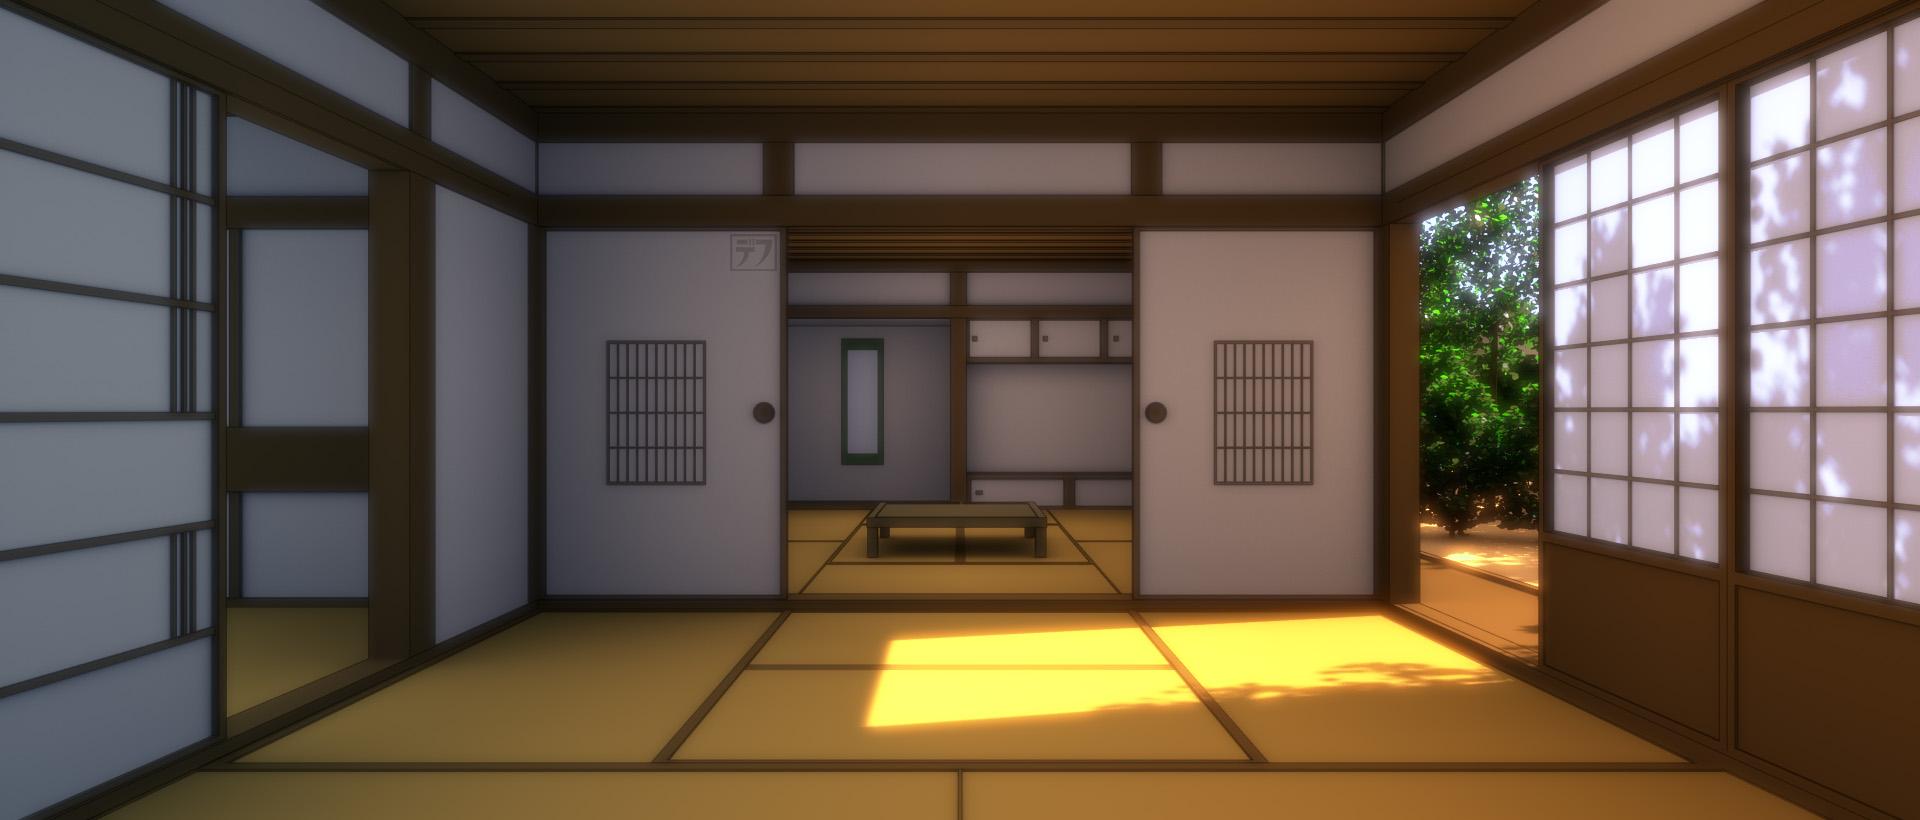 Apquii House Anime_house